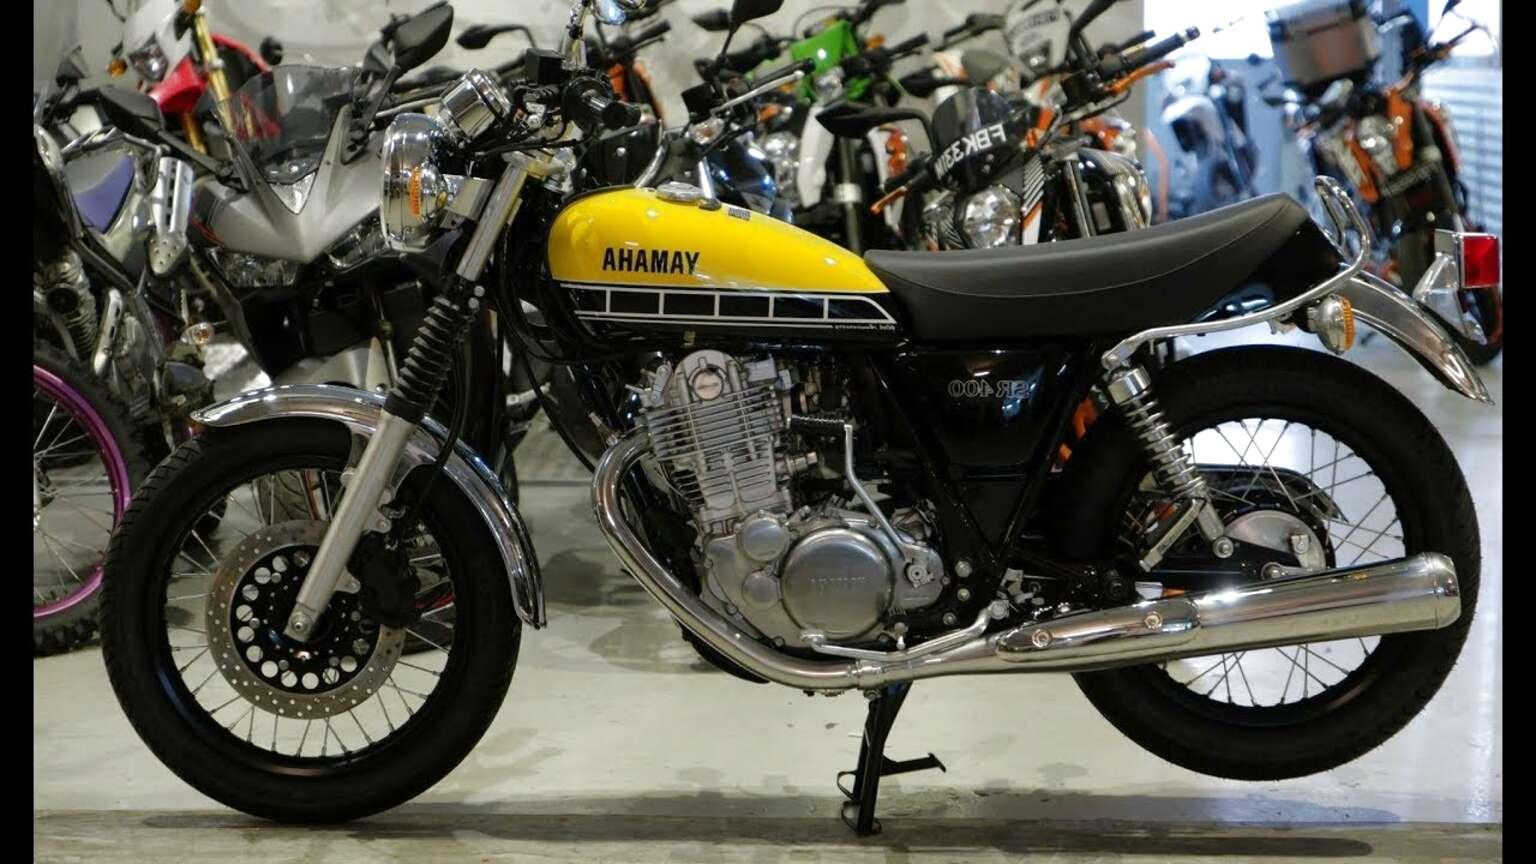 yamaha 400 motorcycle for sale